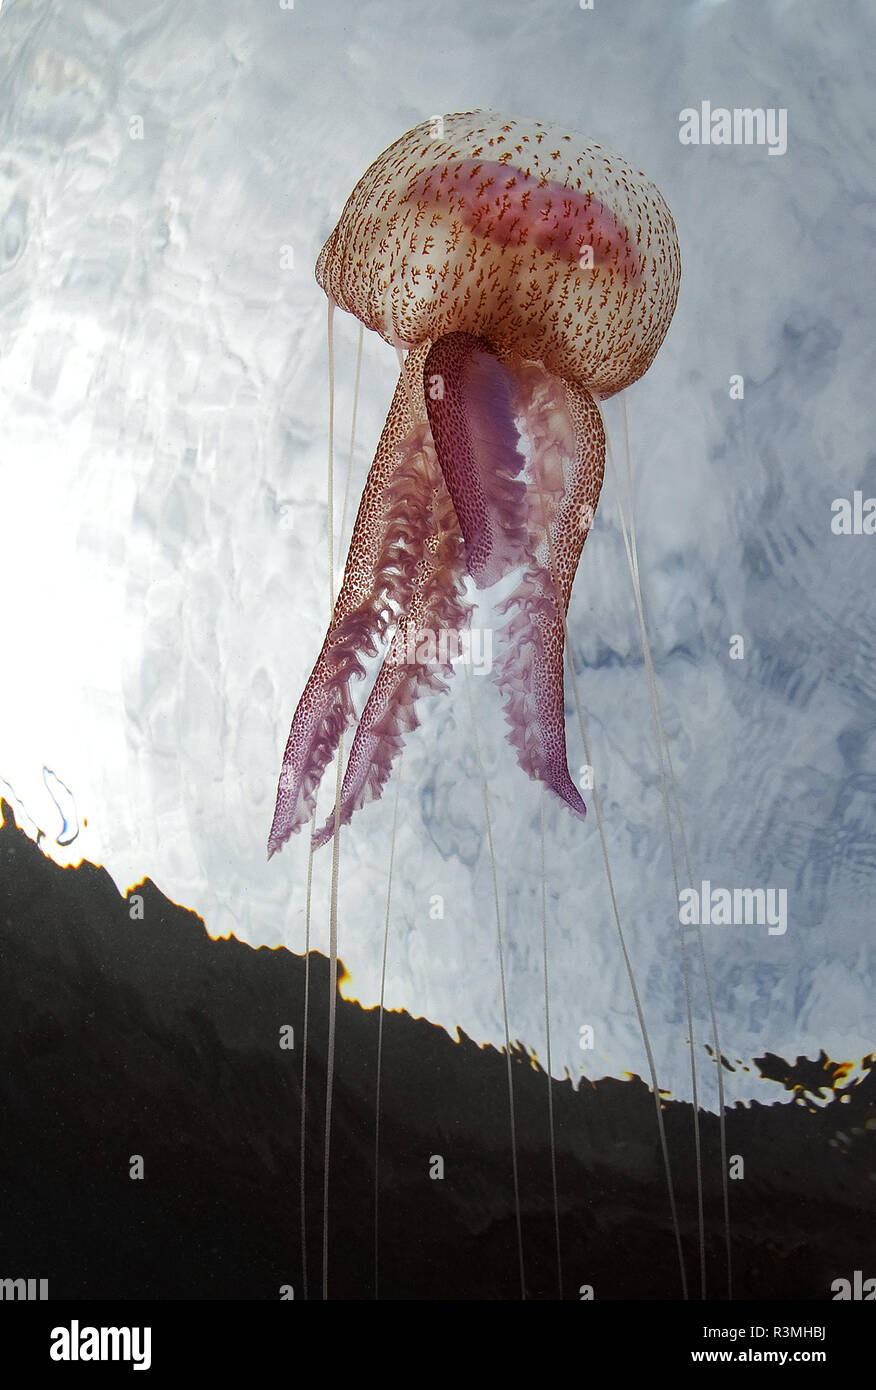 Quallen (Pelagia noctiluca), Teneriffa, wirbellose Meerestiere der Kanarischen Inseln. Stockfoto